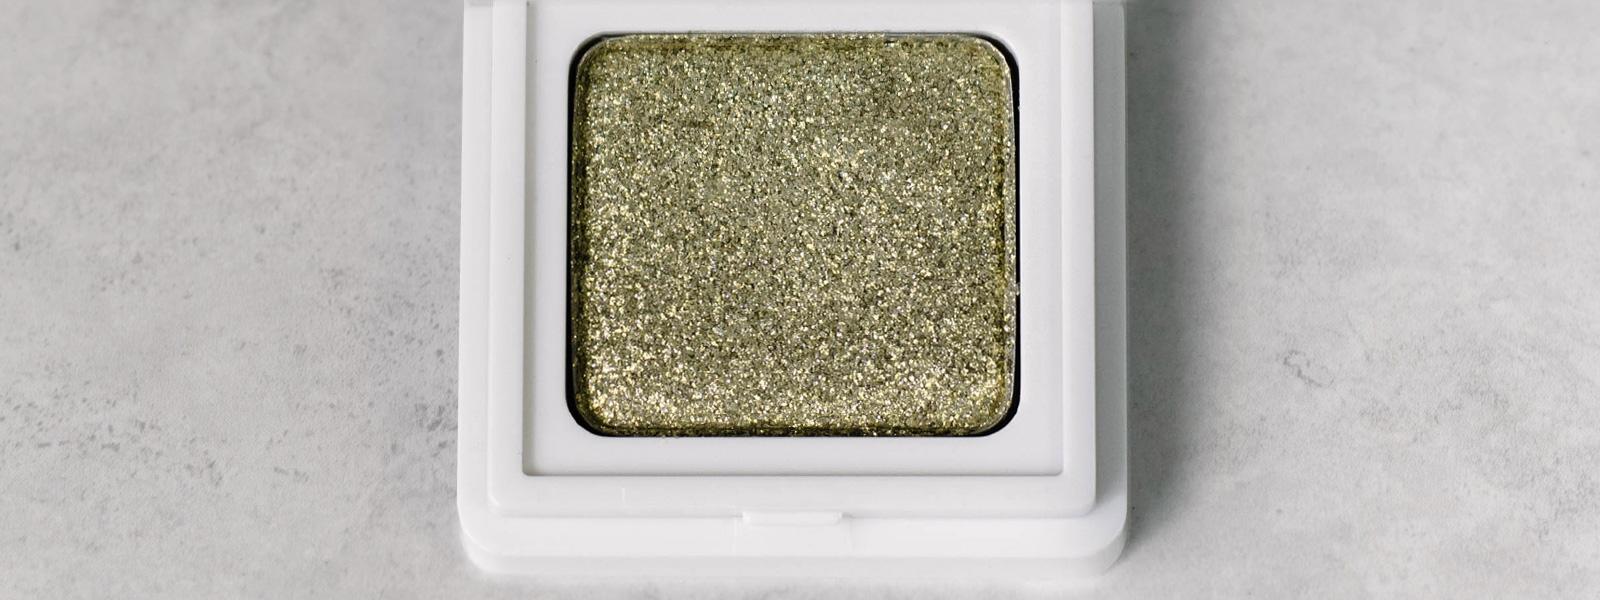 natasha denona eye shadow true gold